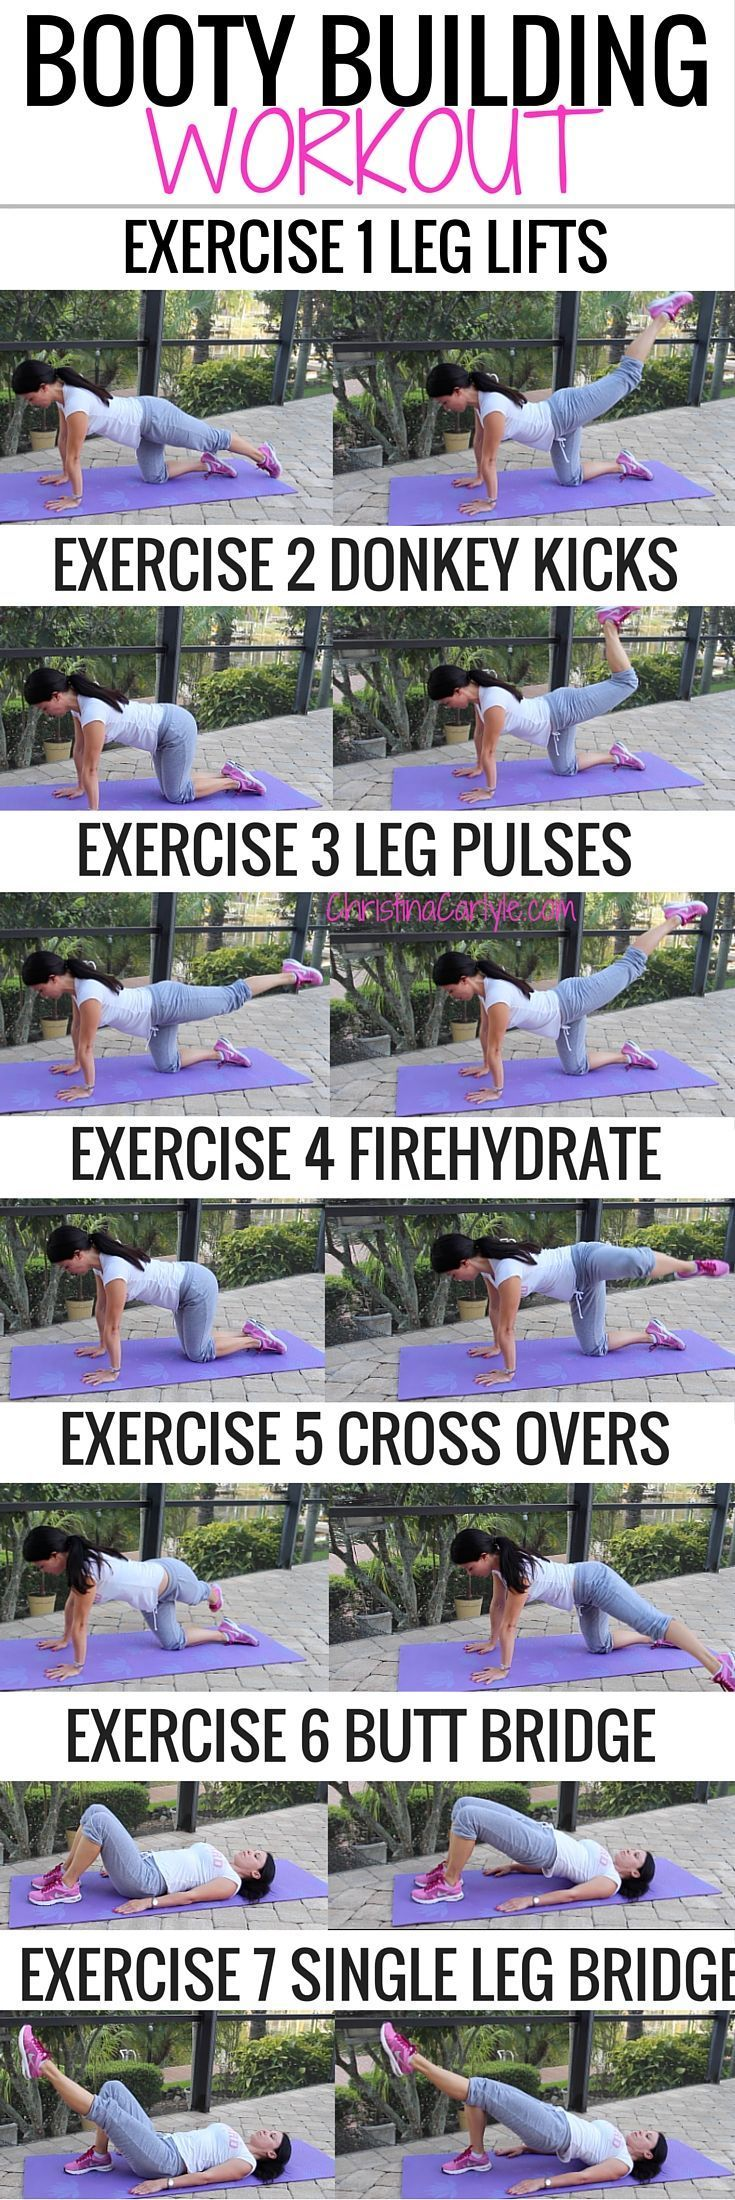 Butt Exercises.  The best booty building exercises for women.